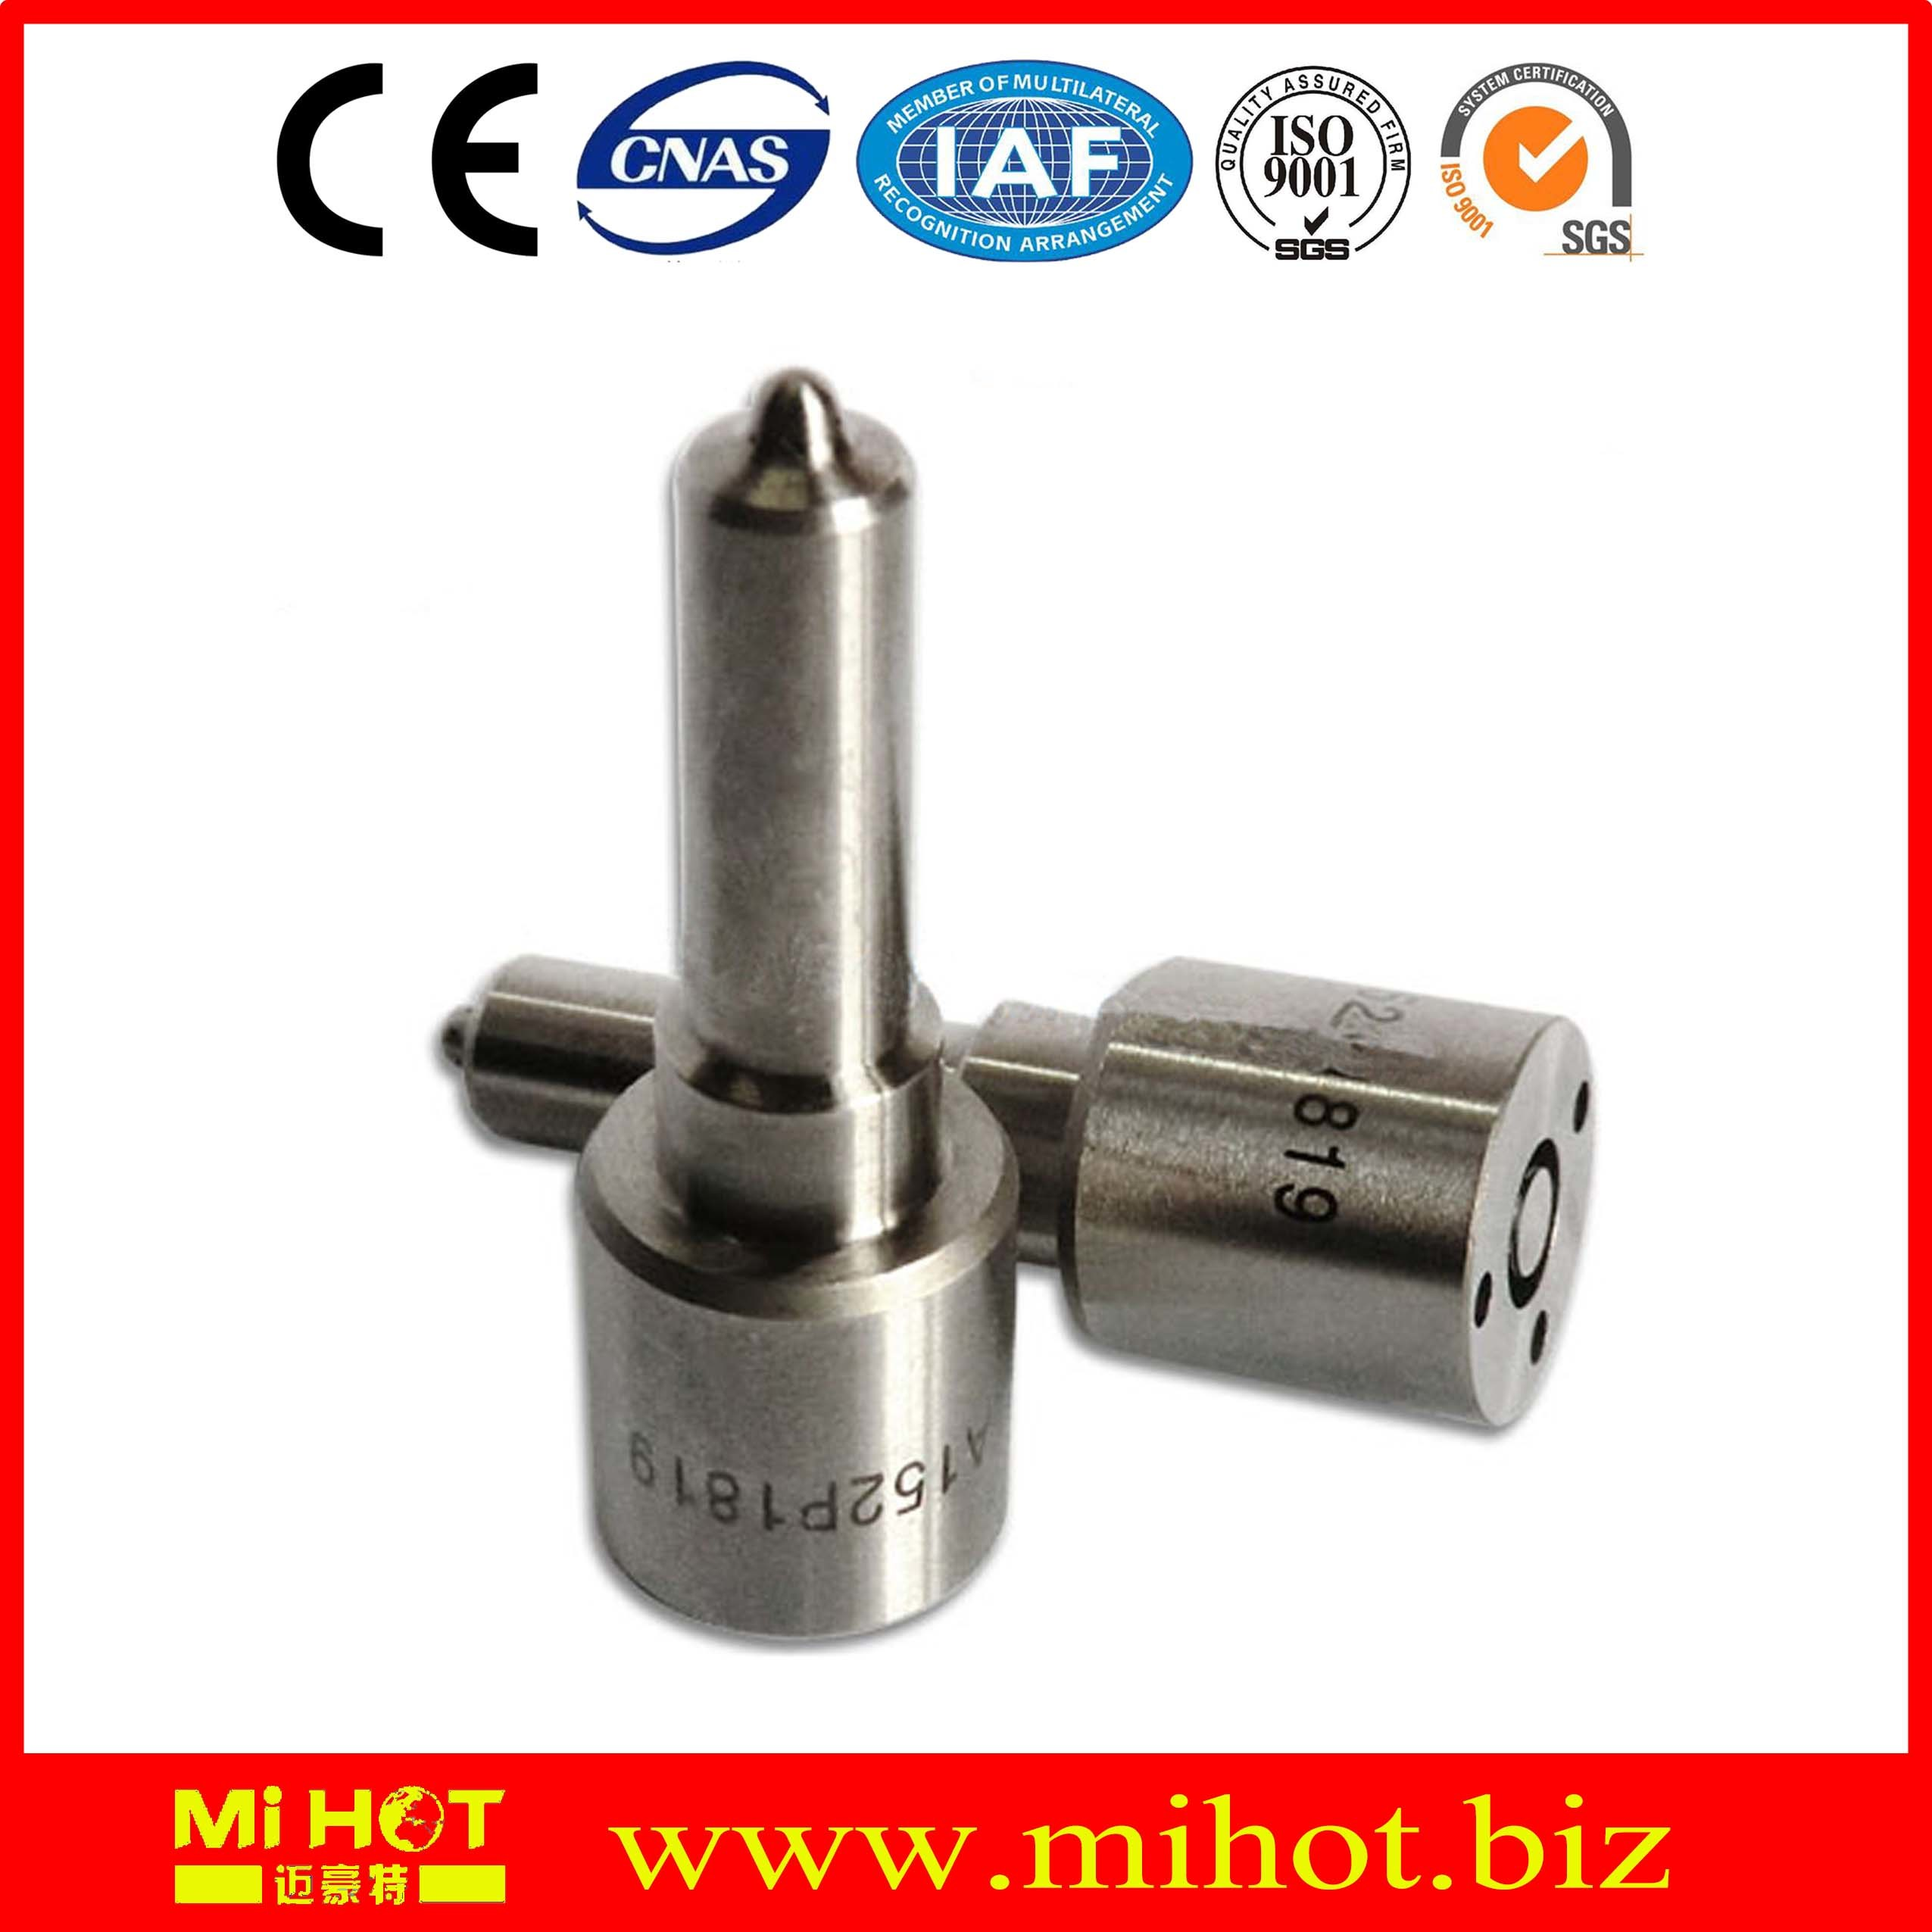 Common Rail Diesel Injector Nozzle Dlla155p842